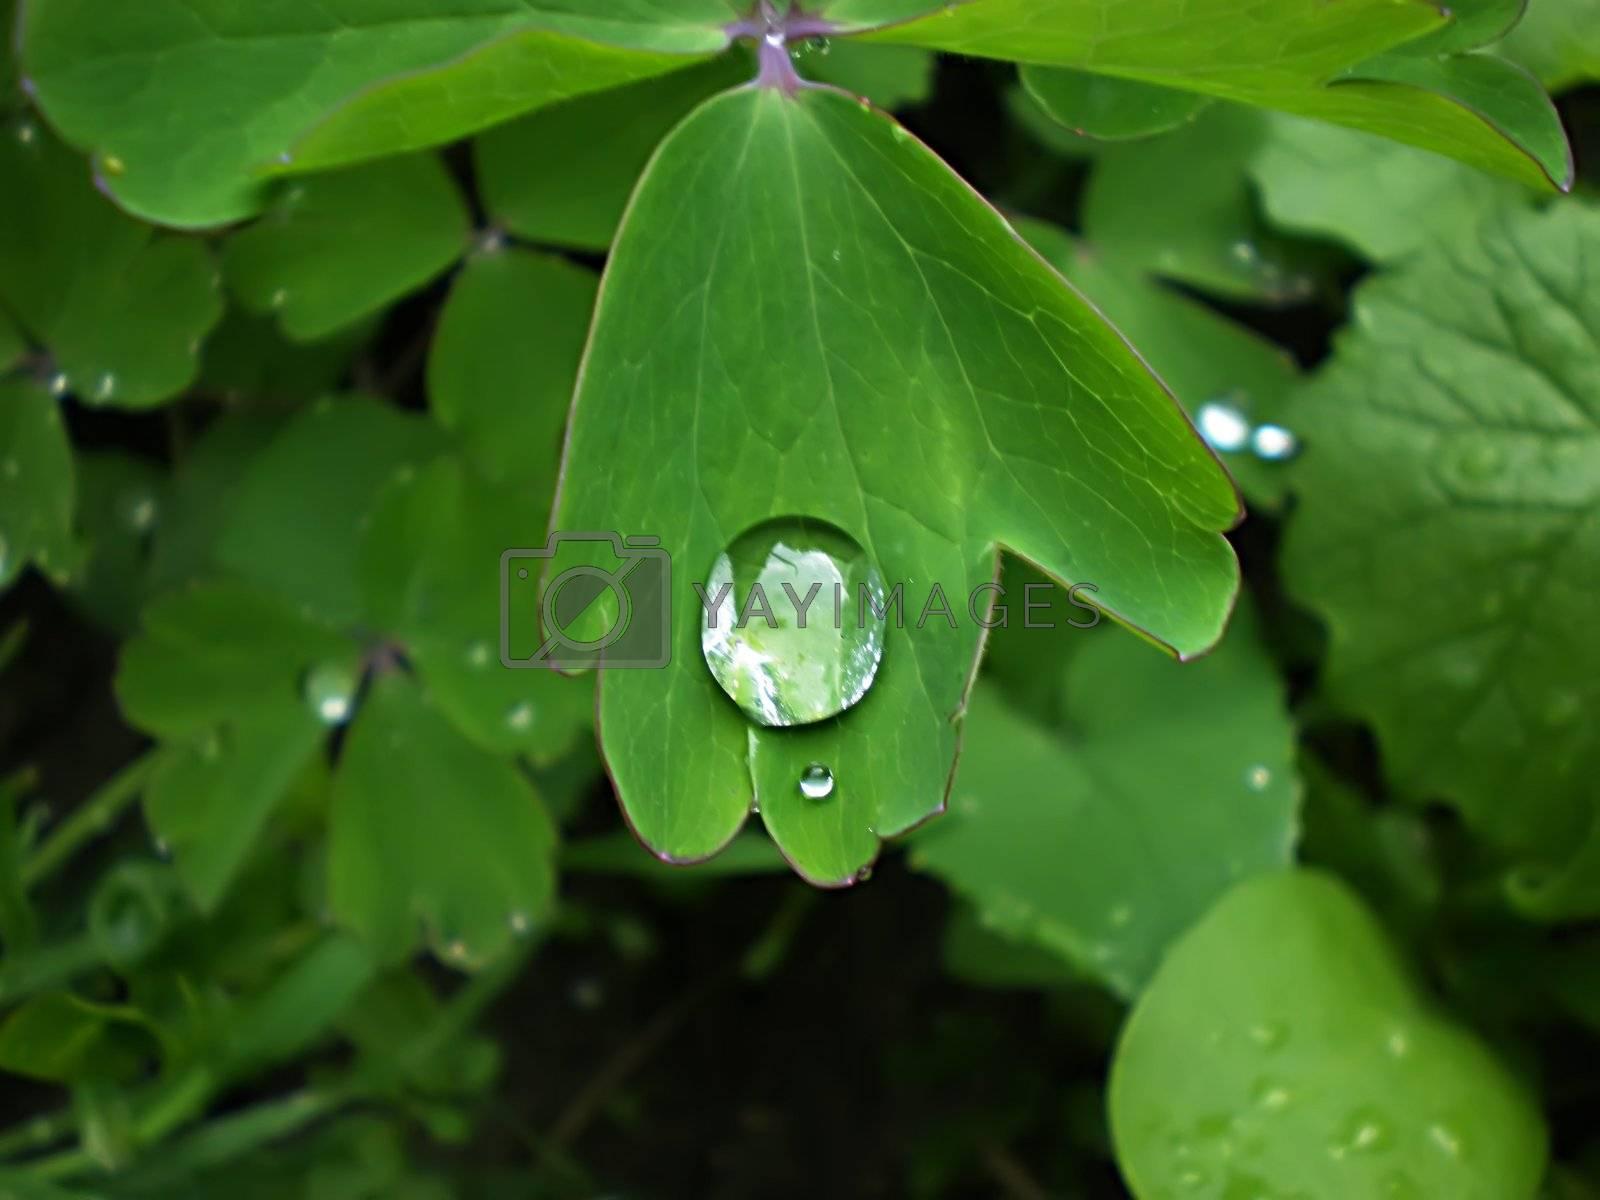 Royalty free image of dew drop by Dessie_bg